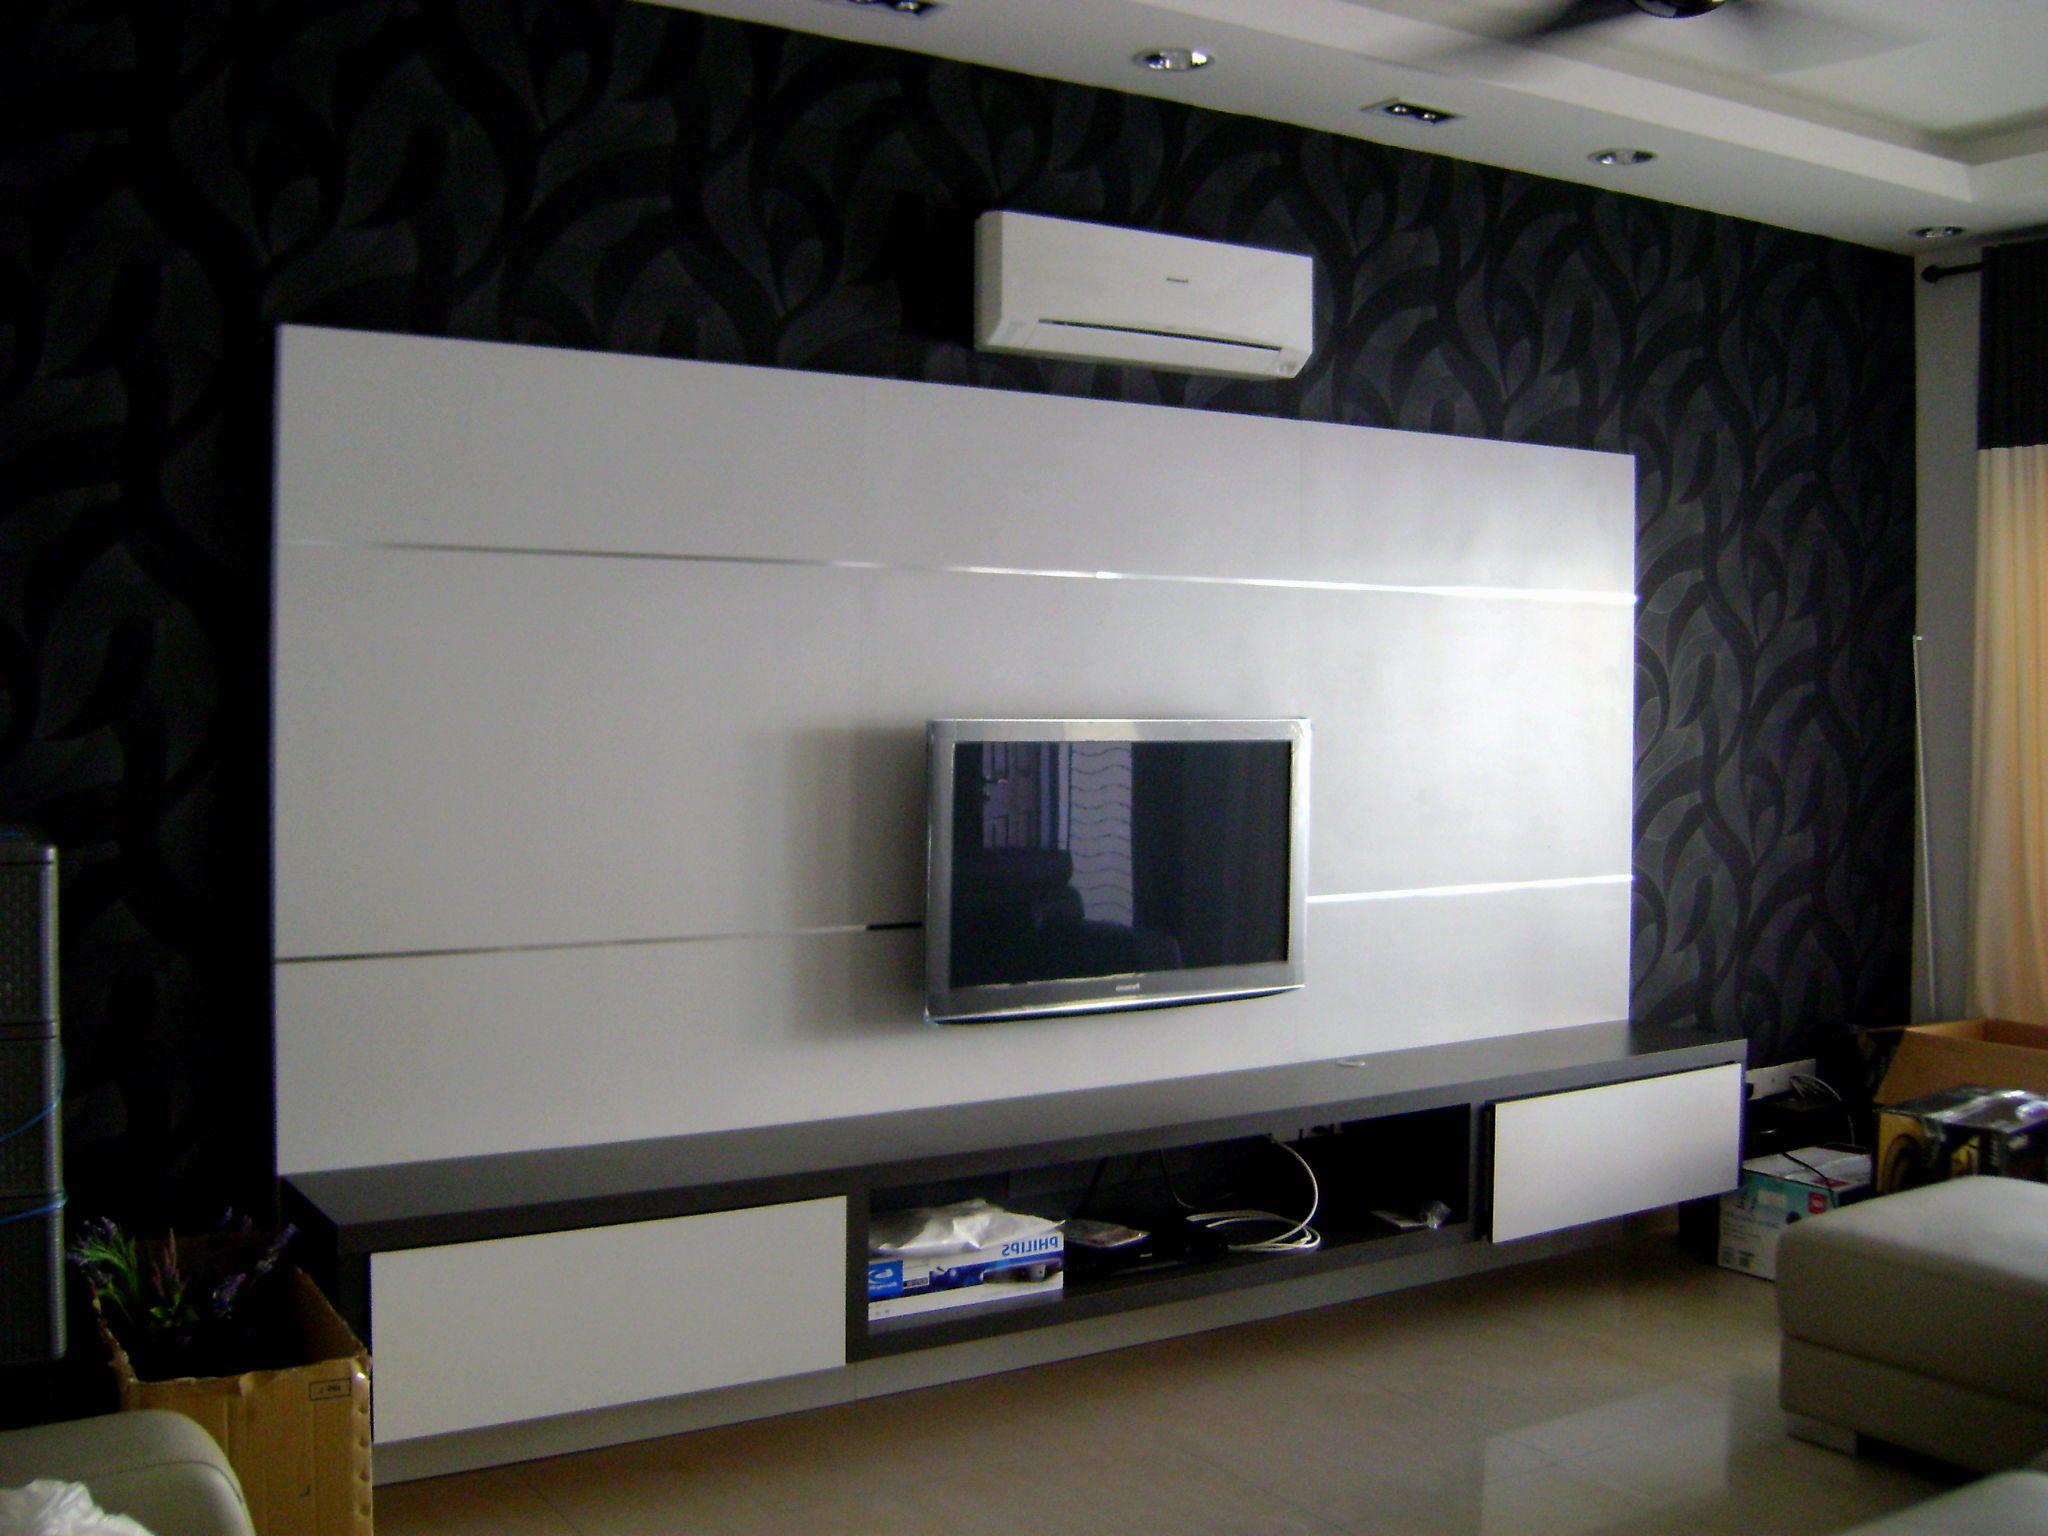 Armoire For Room Divider Living Large Flat Screen Tv Design Cabinet